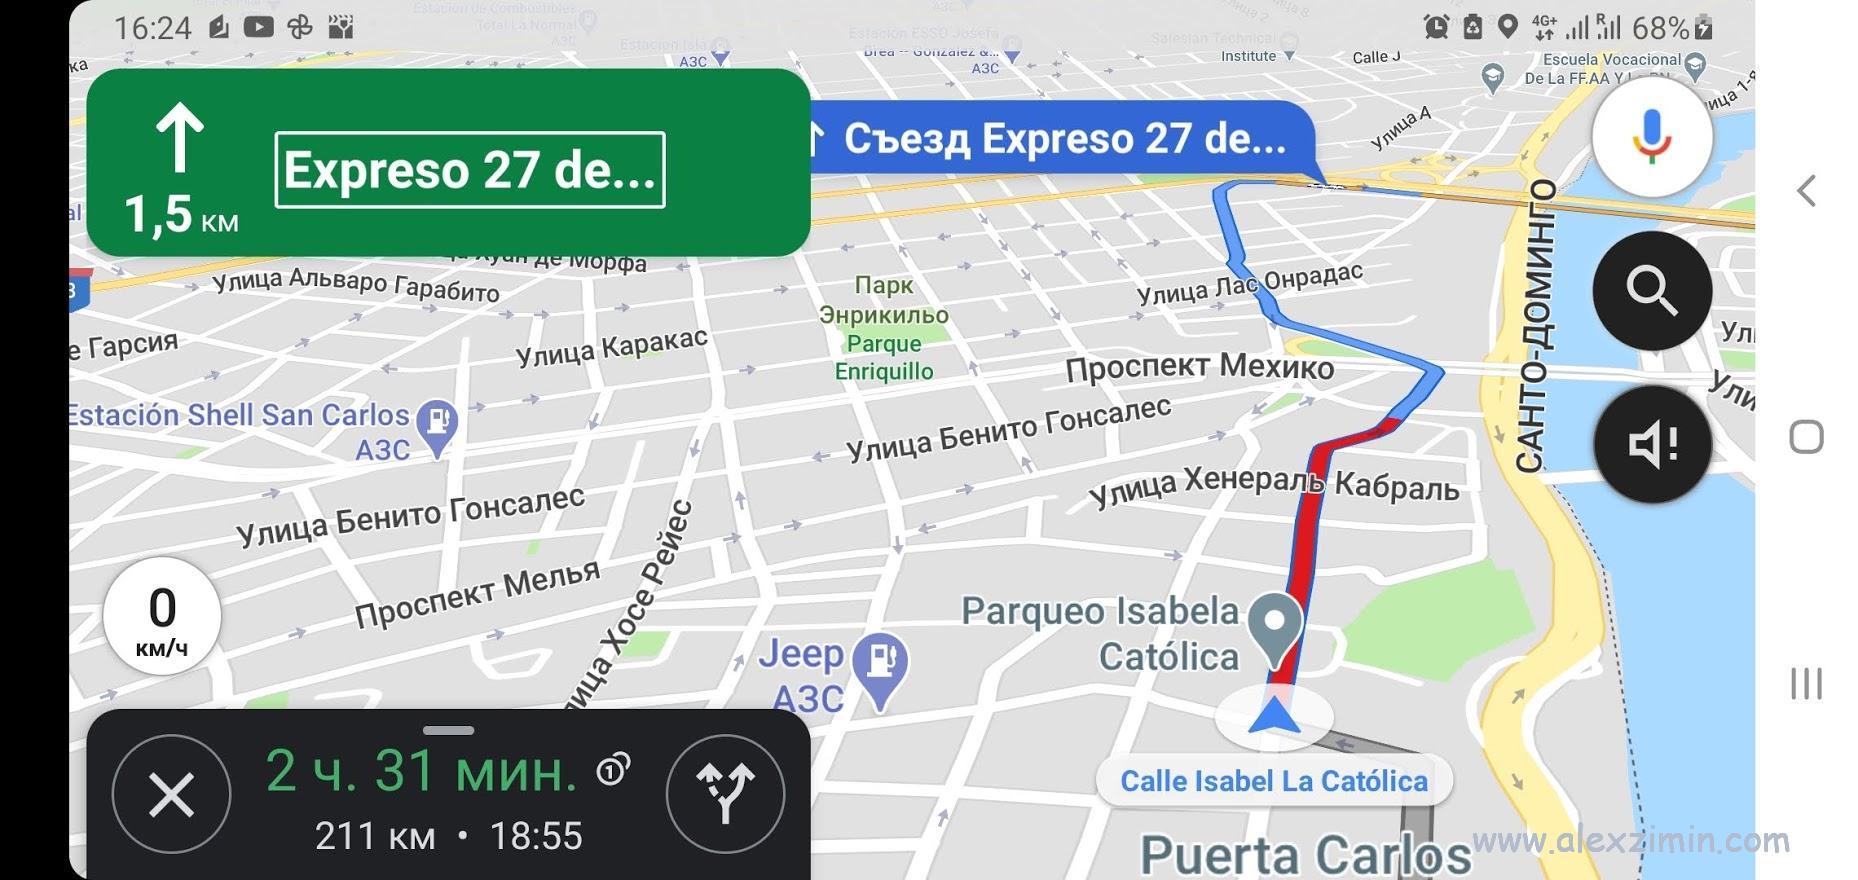 Маршрут на гугл картах из центра Санта-Доминго до нашего отеля